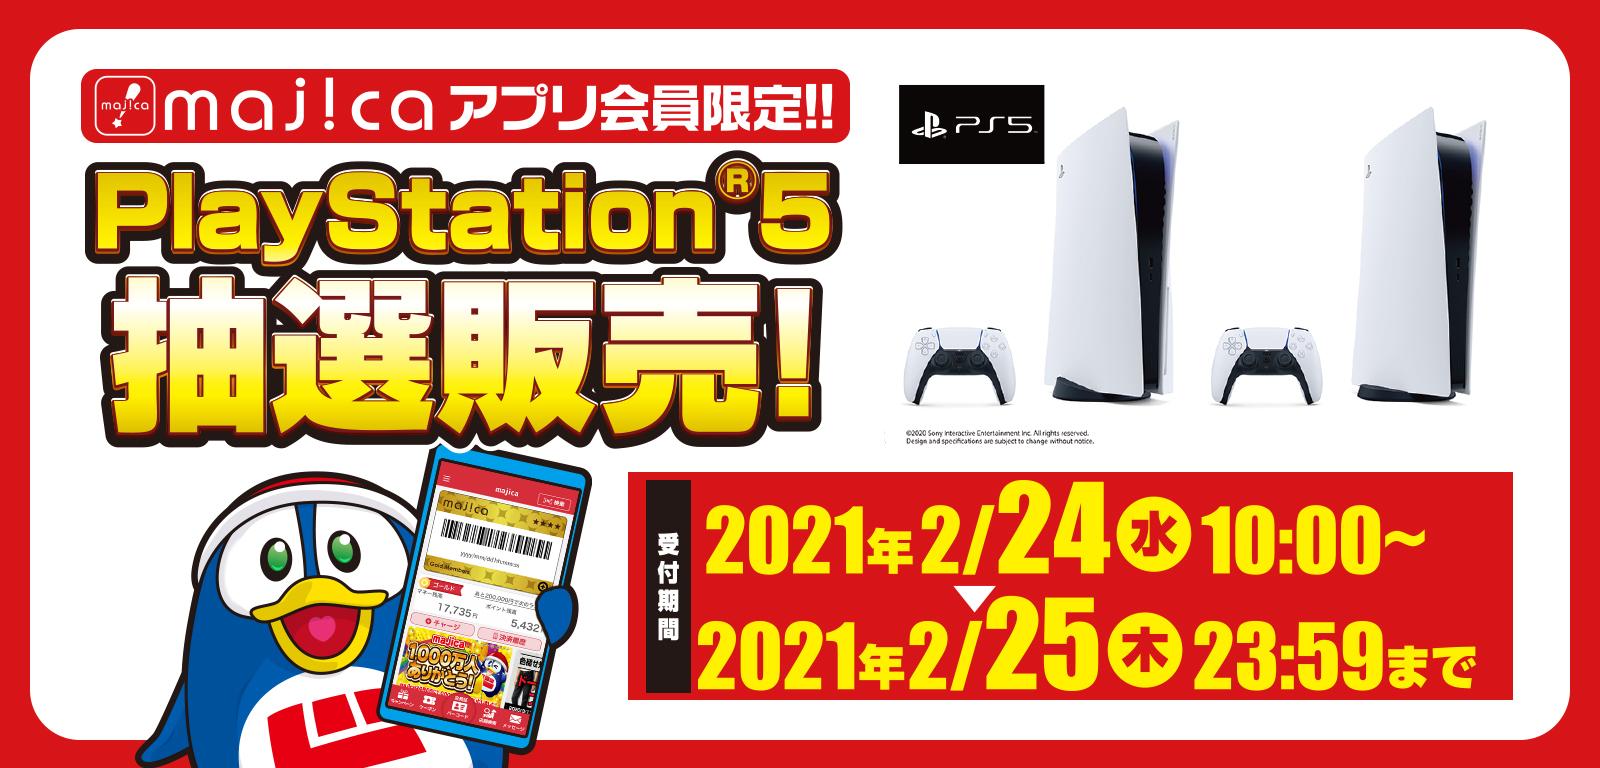 majicaアプリ会員限定!!PlayStation®5抽選販売! 受付期間2021年2月24日(水)10:00 ~ 2021年2月25日(木)23:59まで